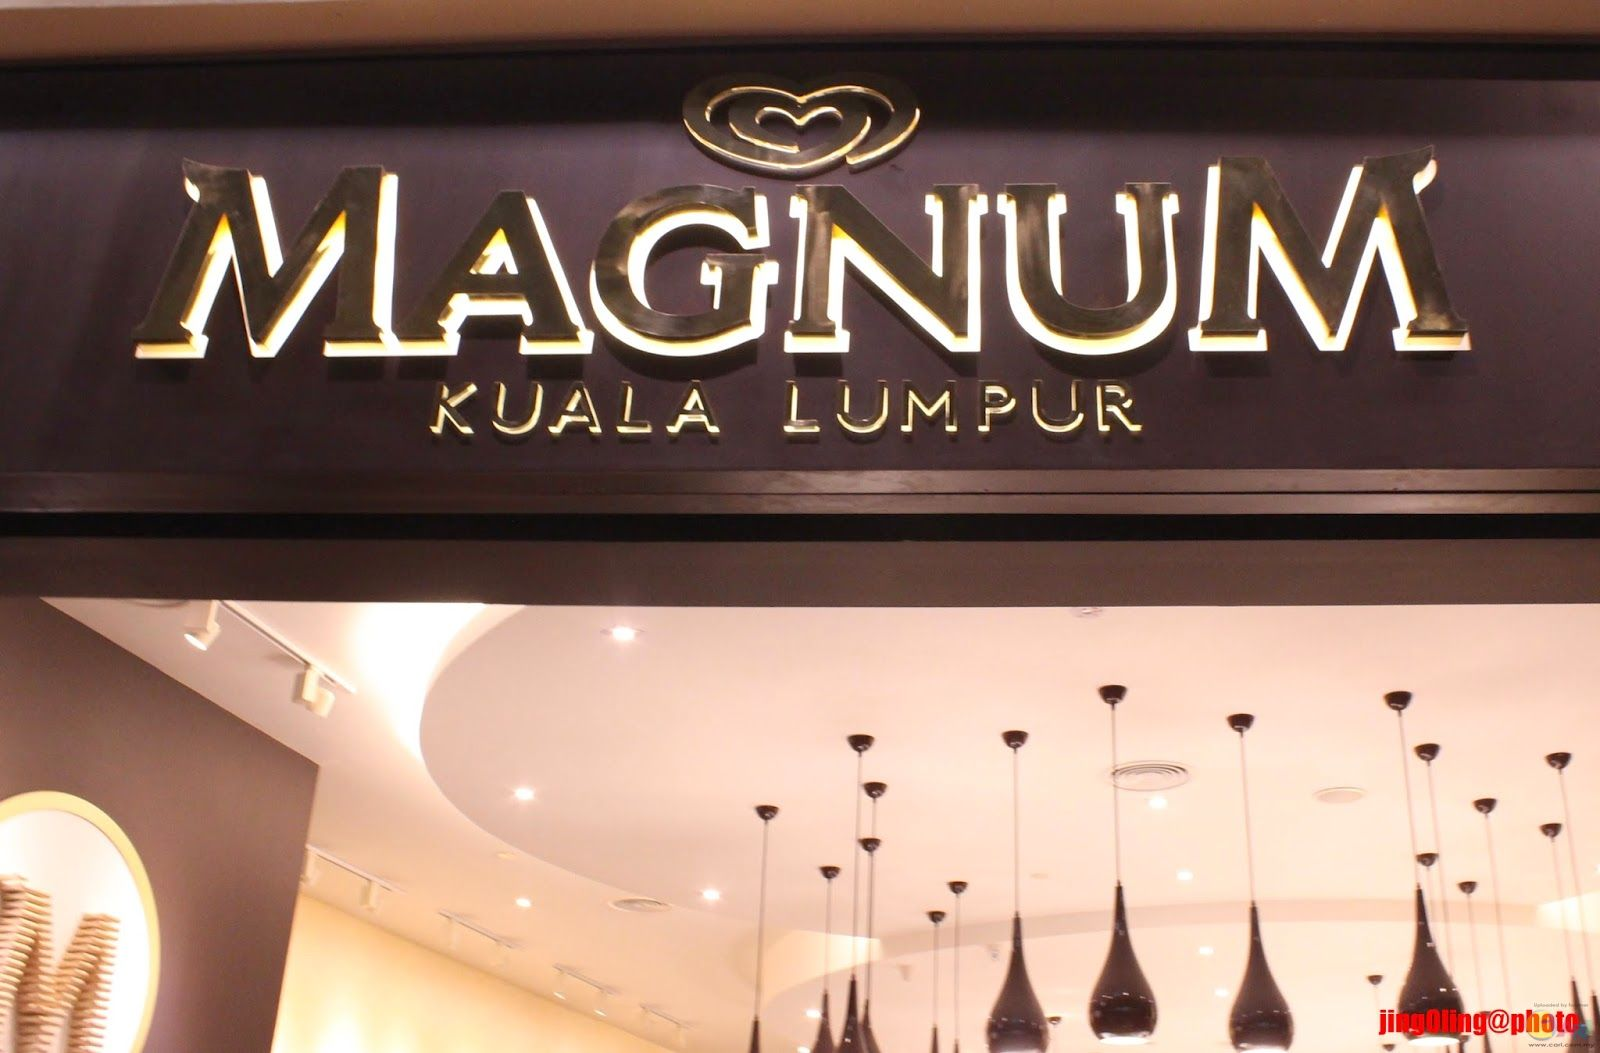 ���������ŵ������ Magnum Kuala Lumpur